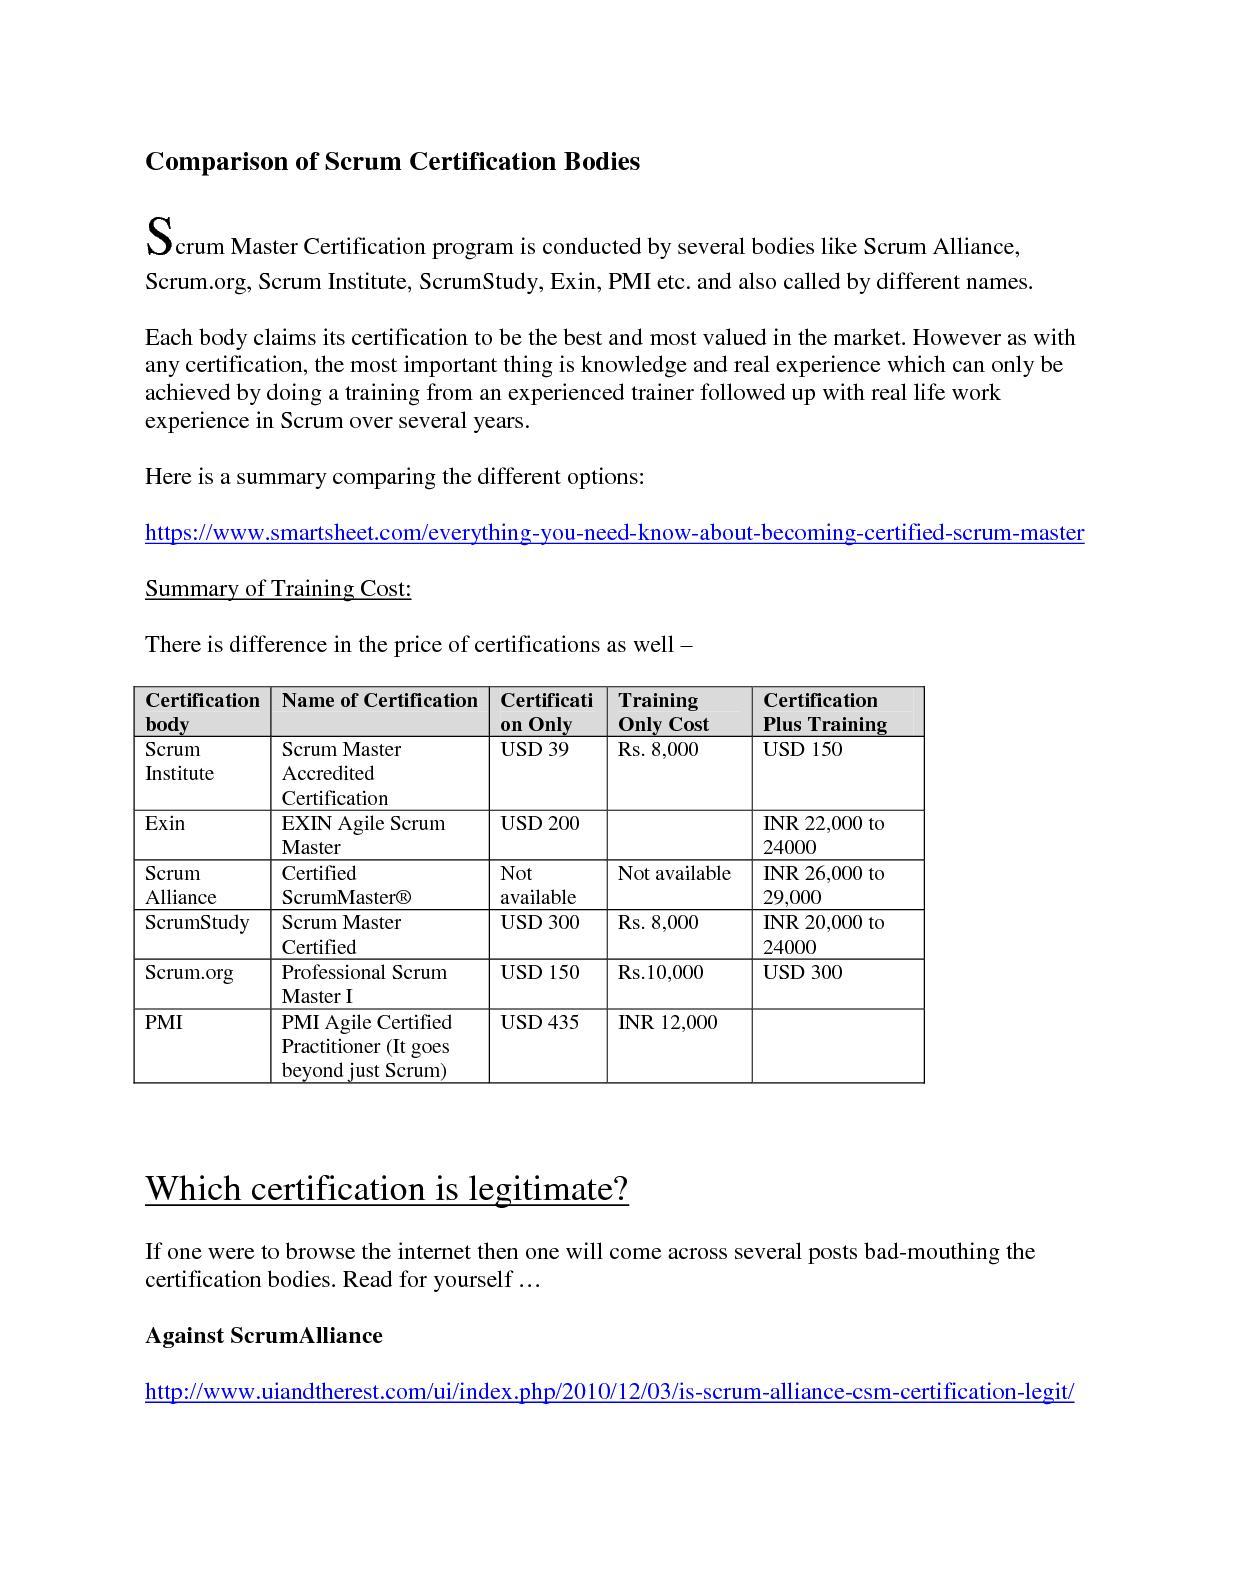 Calamo Comparison Of Scrum Certification Bodies